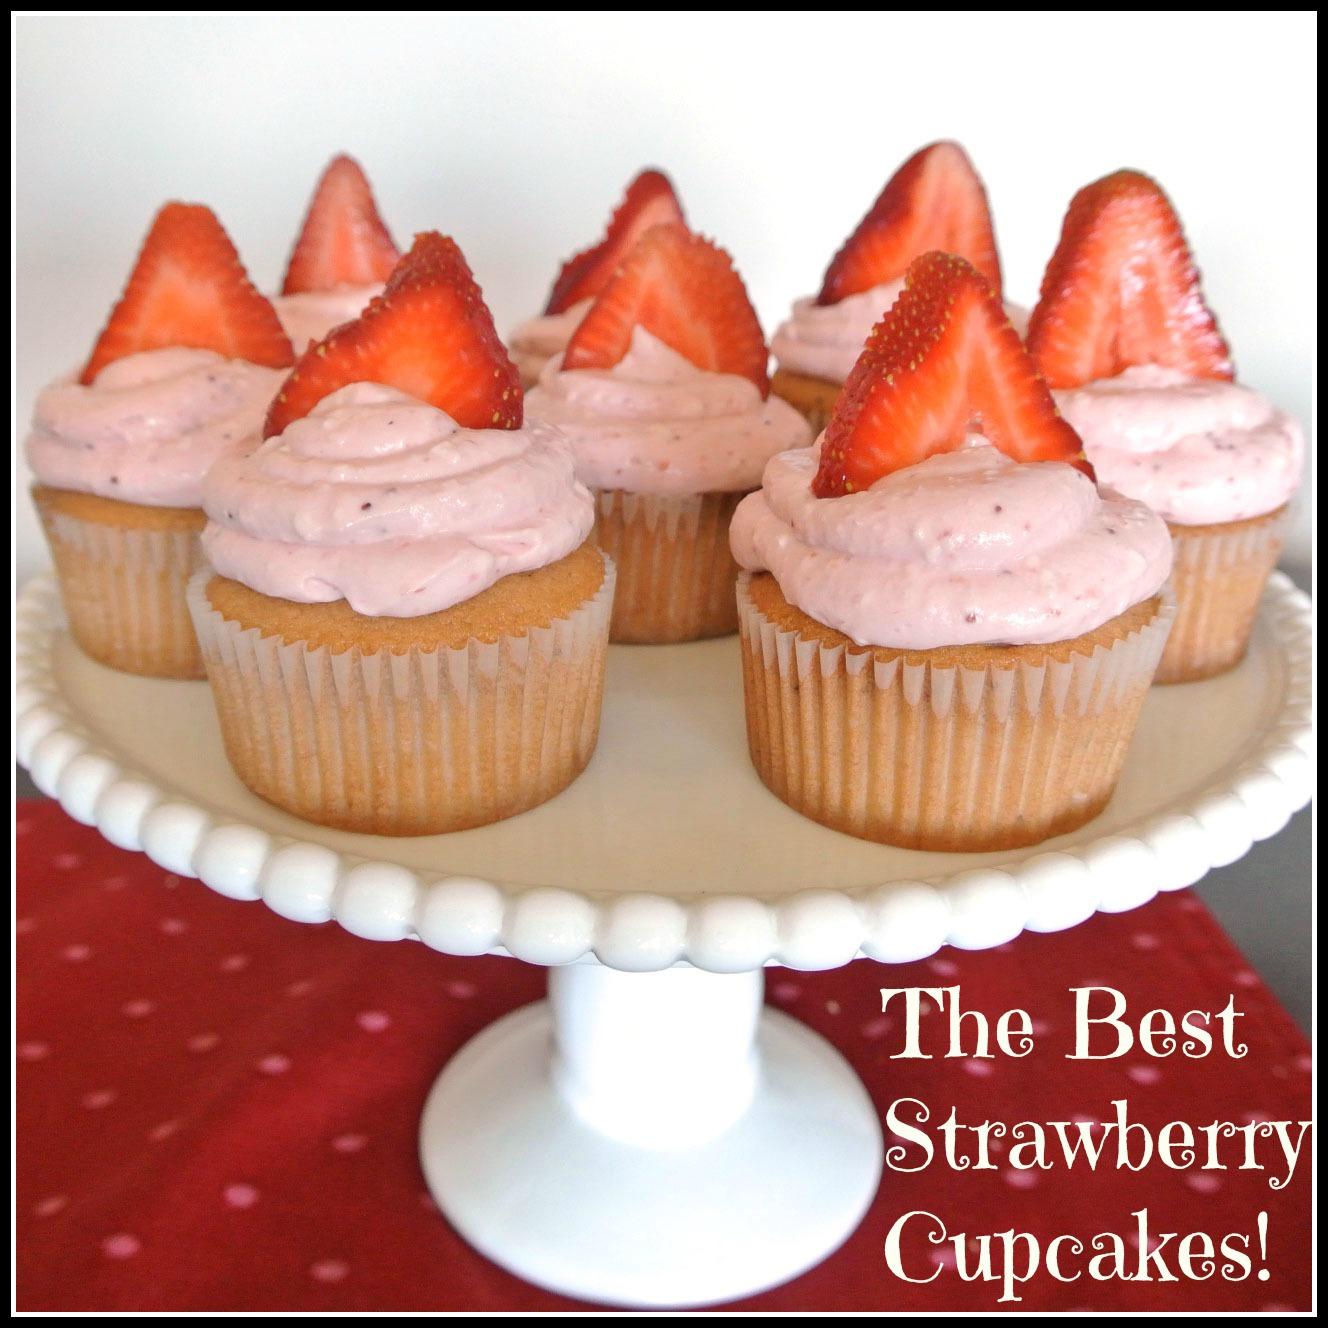 Best Gourmet Cupcakes